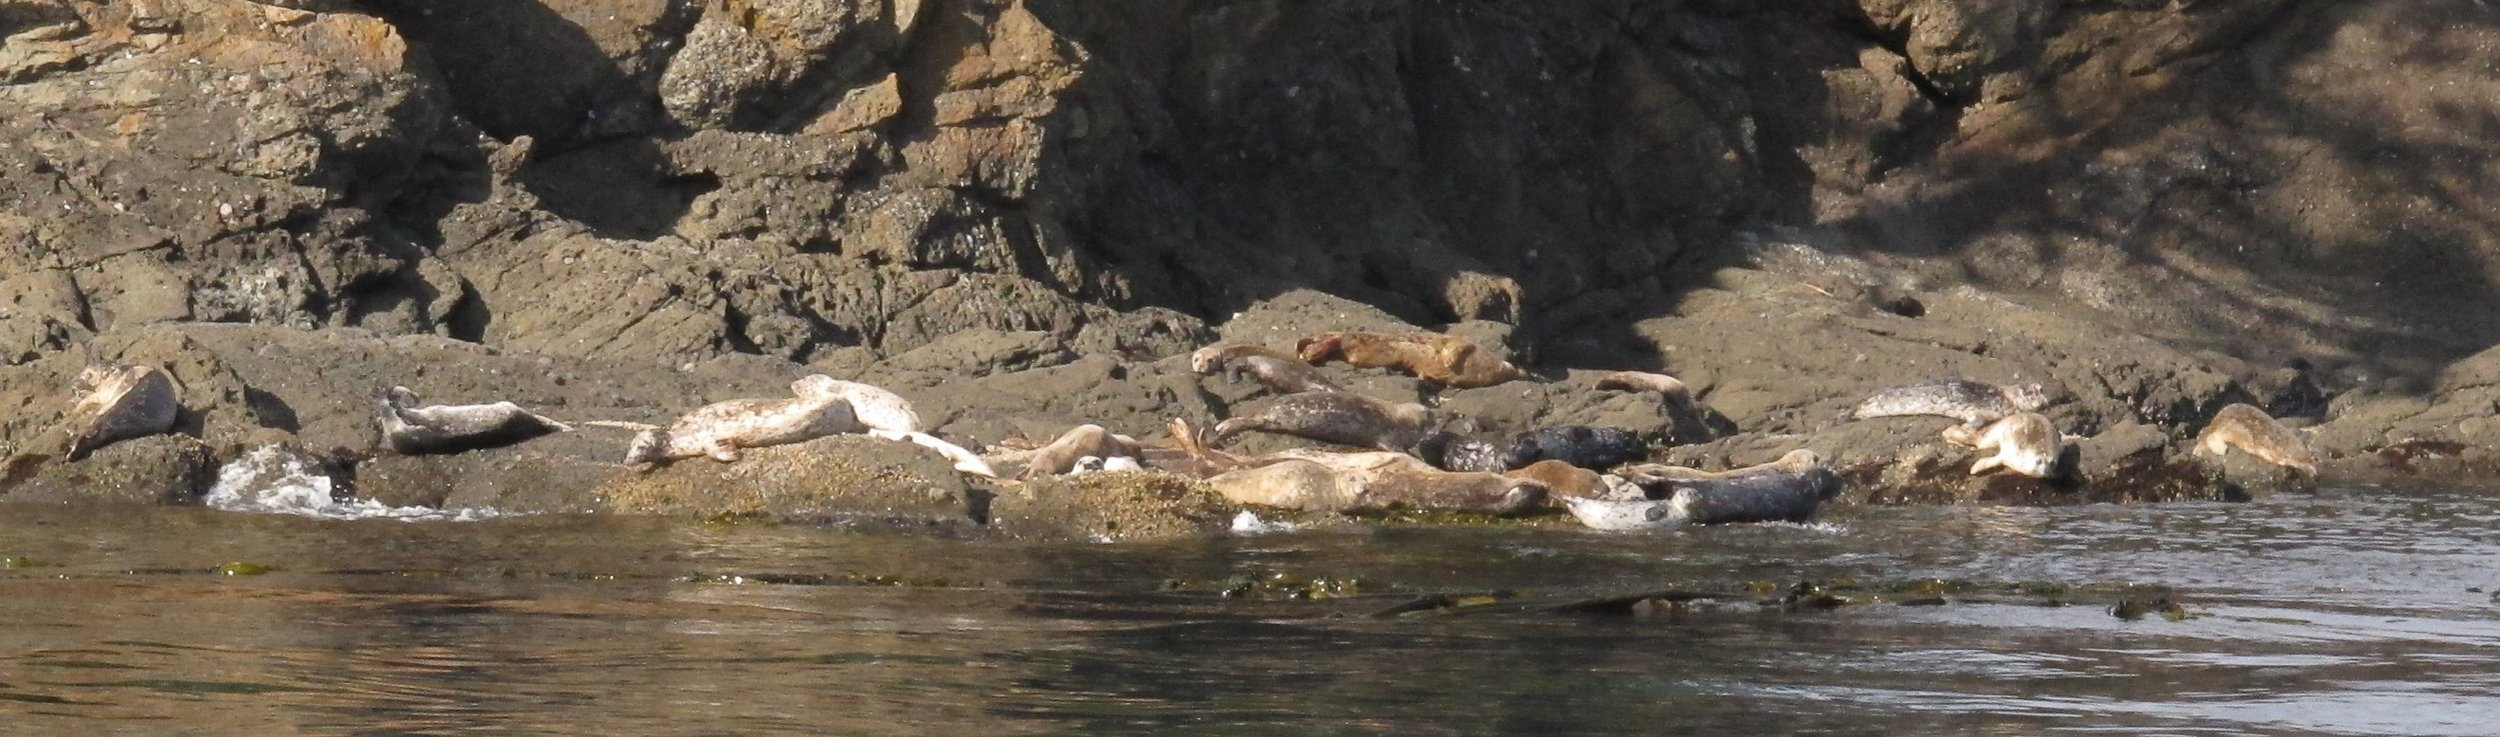 Harbor seals on the southeast corner of Sentinel Island.Photo © Phil Green / TNC